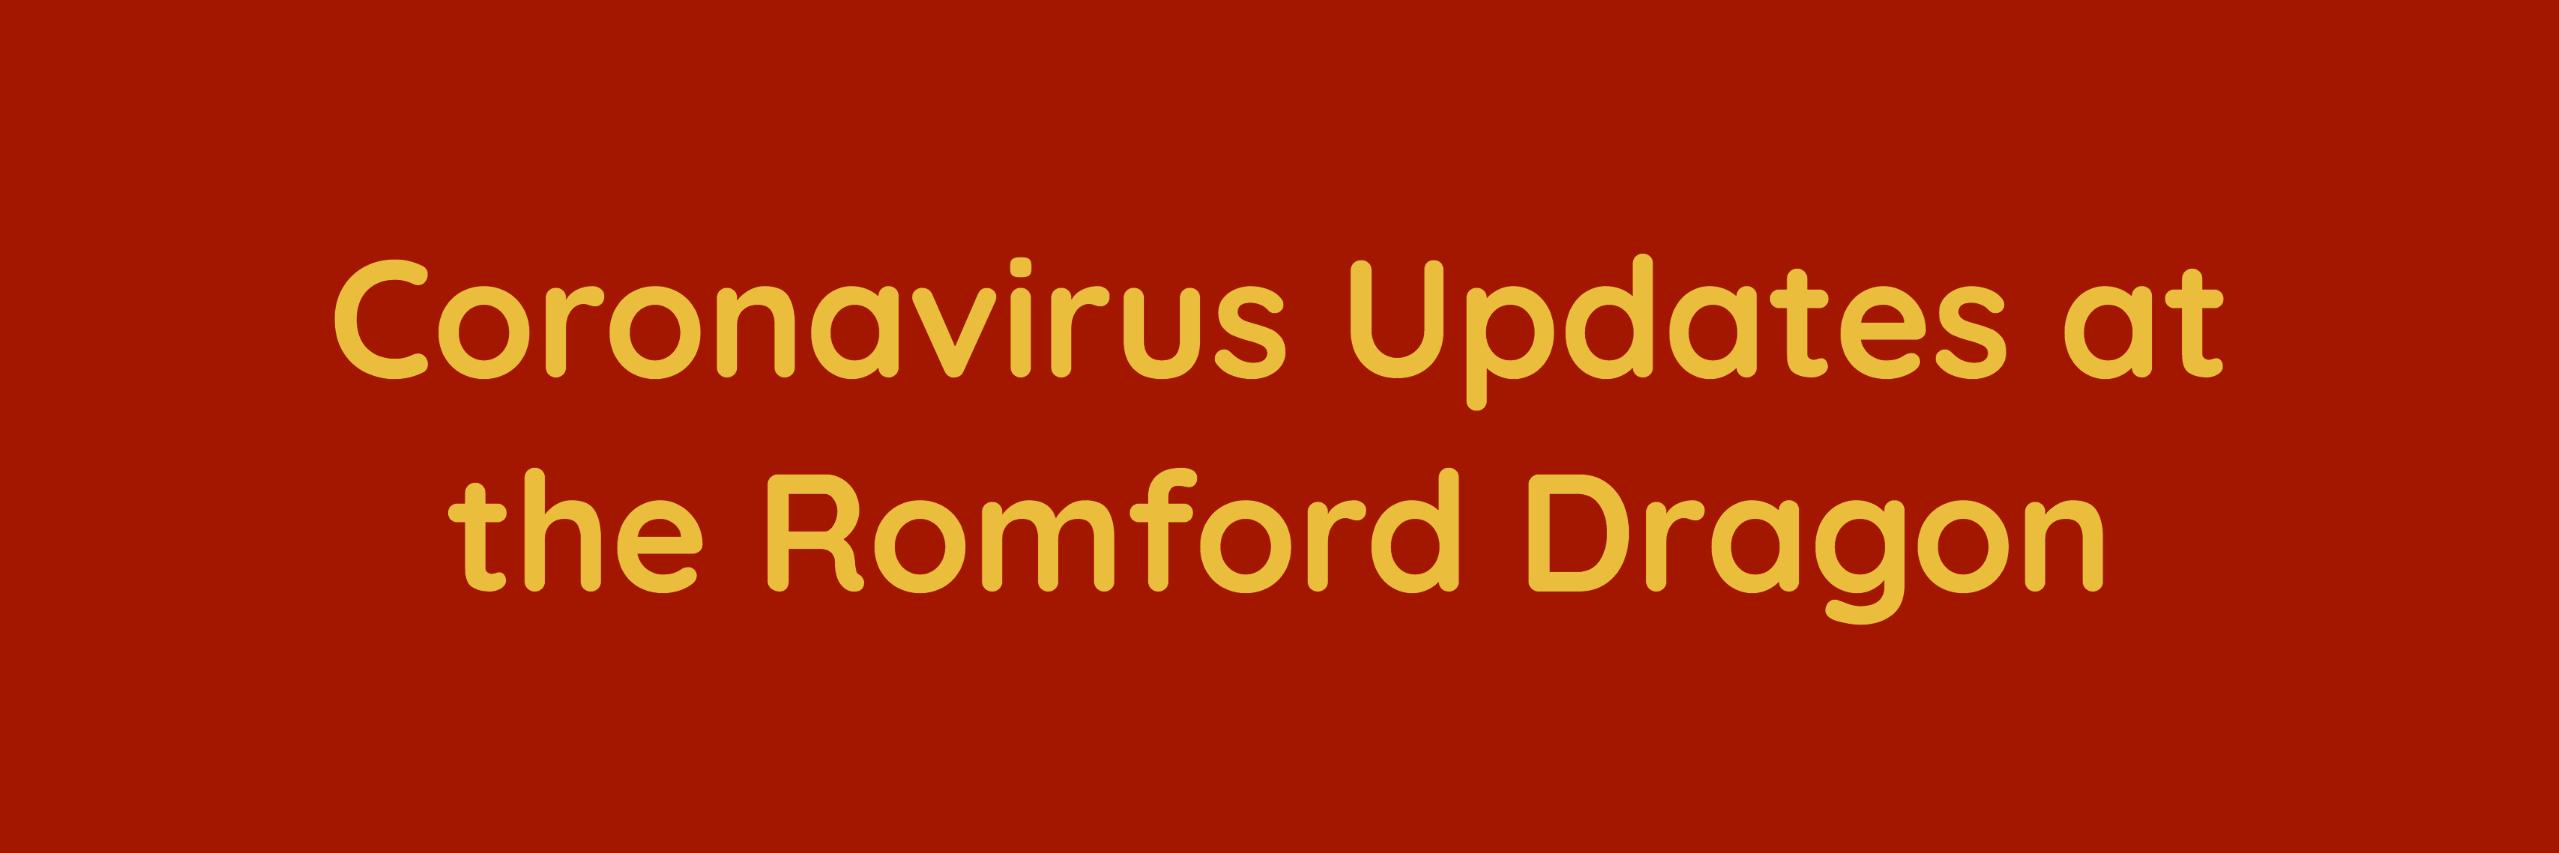 Corona Virus Updates at the Romford Dragon